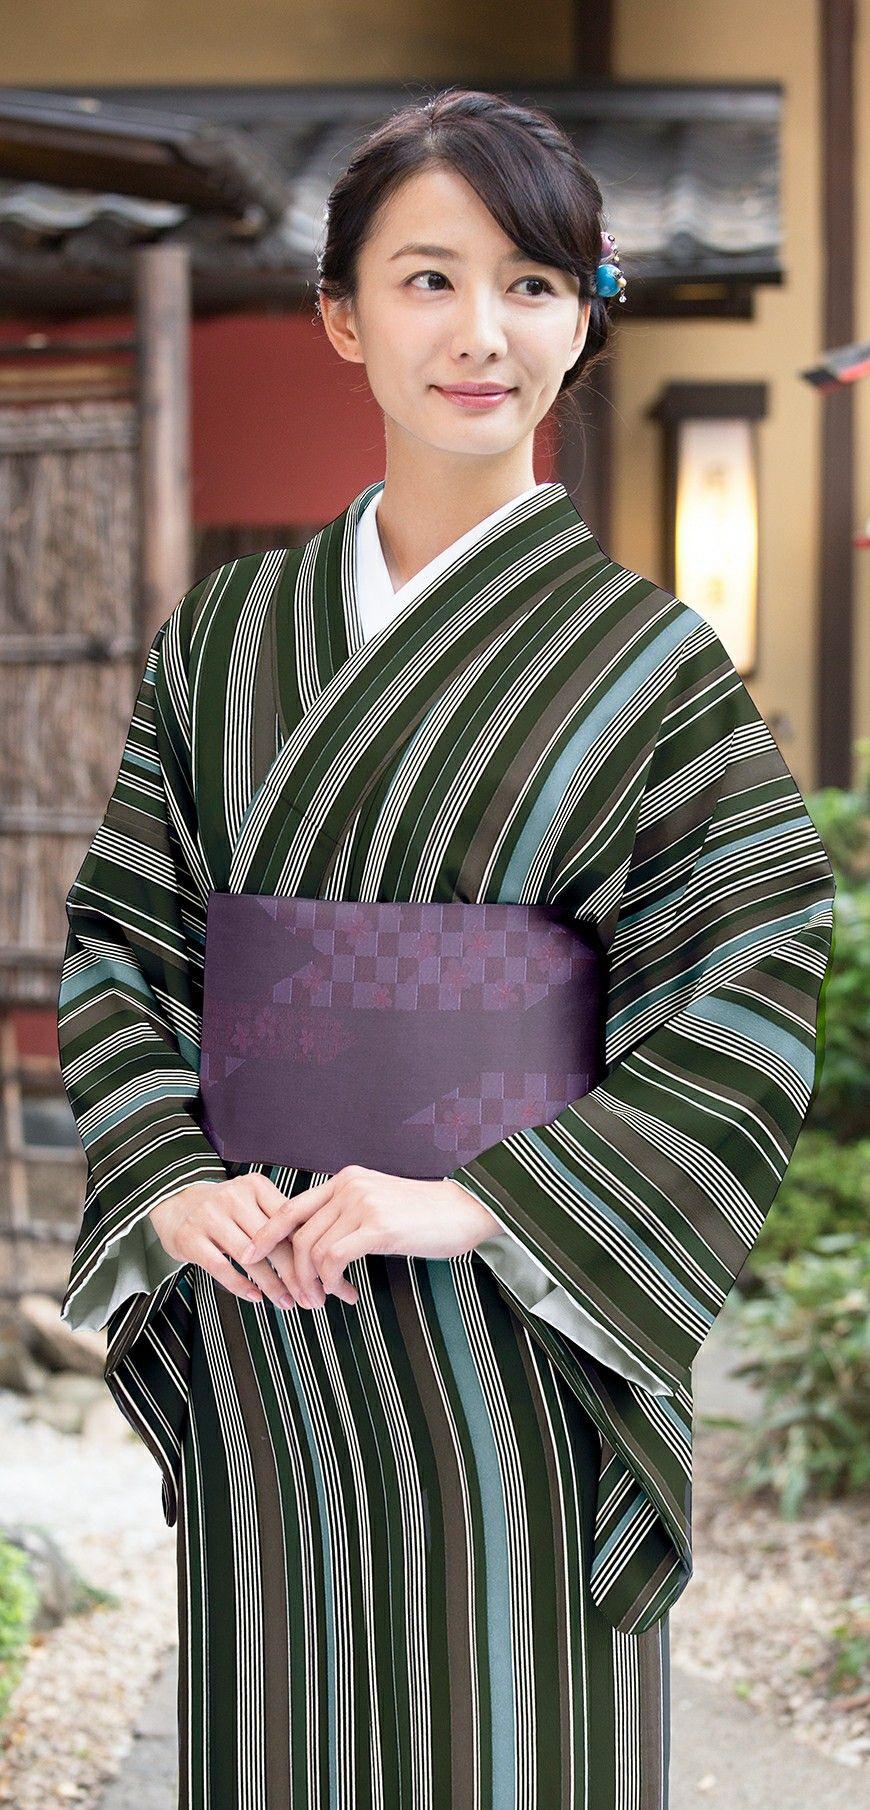 Izumi Sawada is beautiful in Yukata-Kimono design. 澤田泉美 Yukata with Kimono